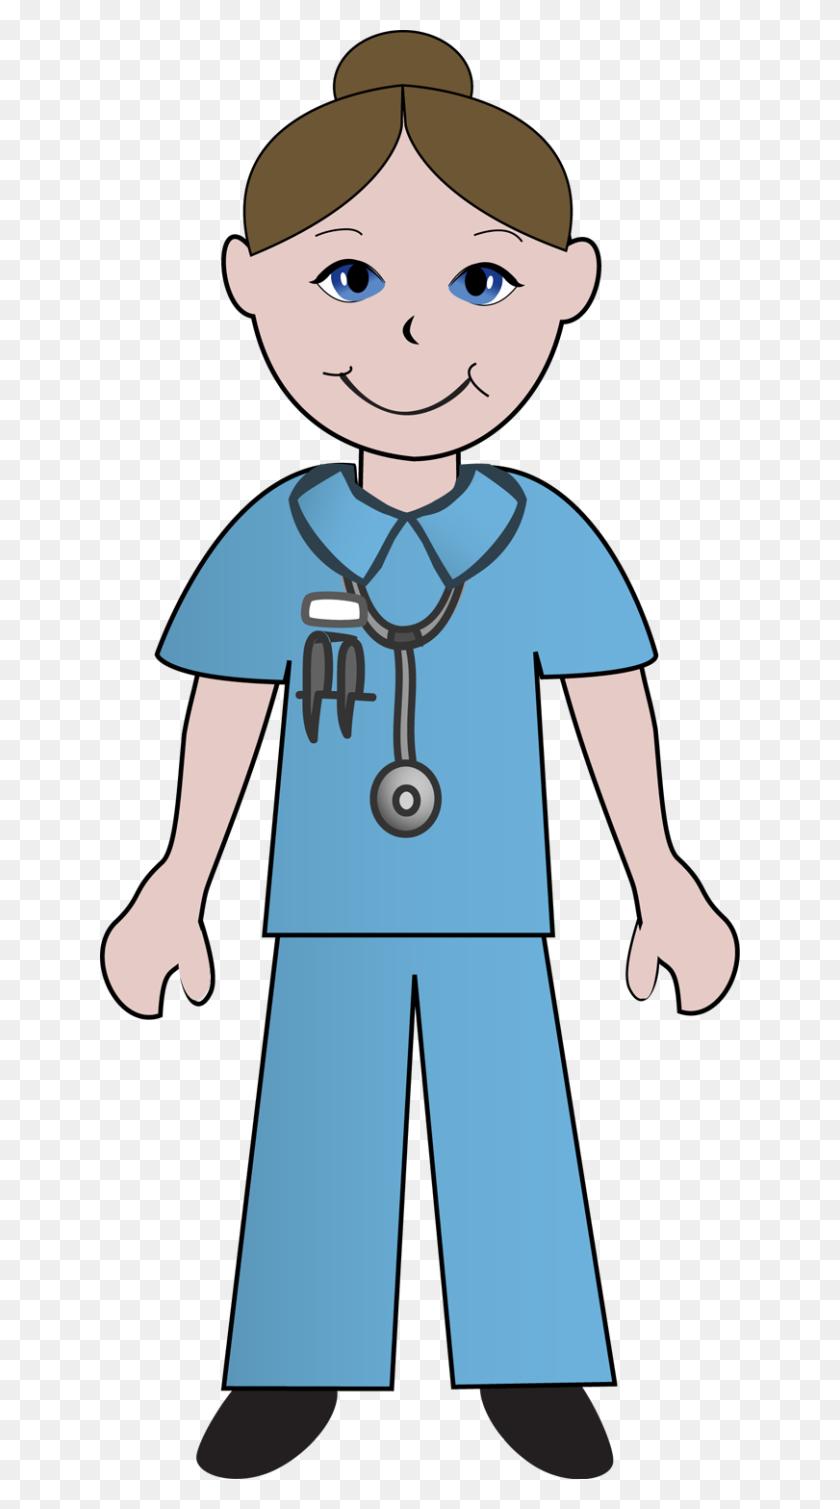 Free Clip Art School Nurse Clipart Image - School Girl Clipart